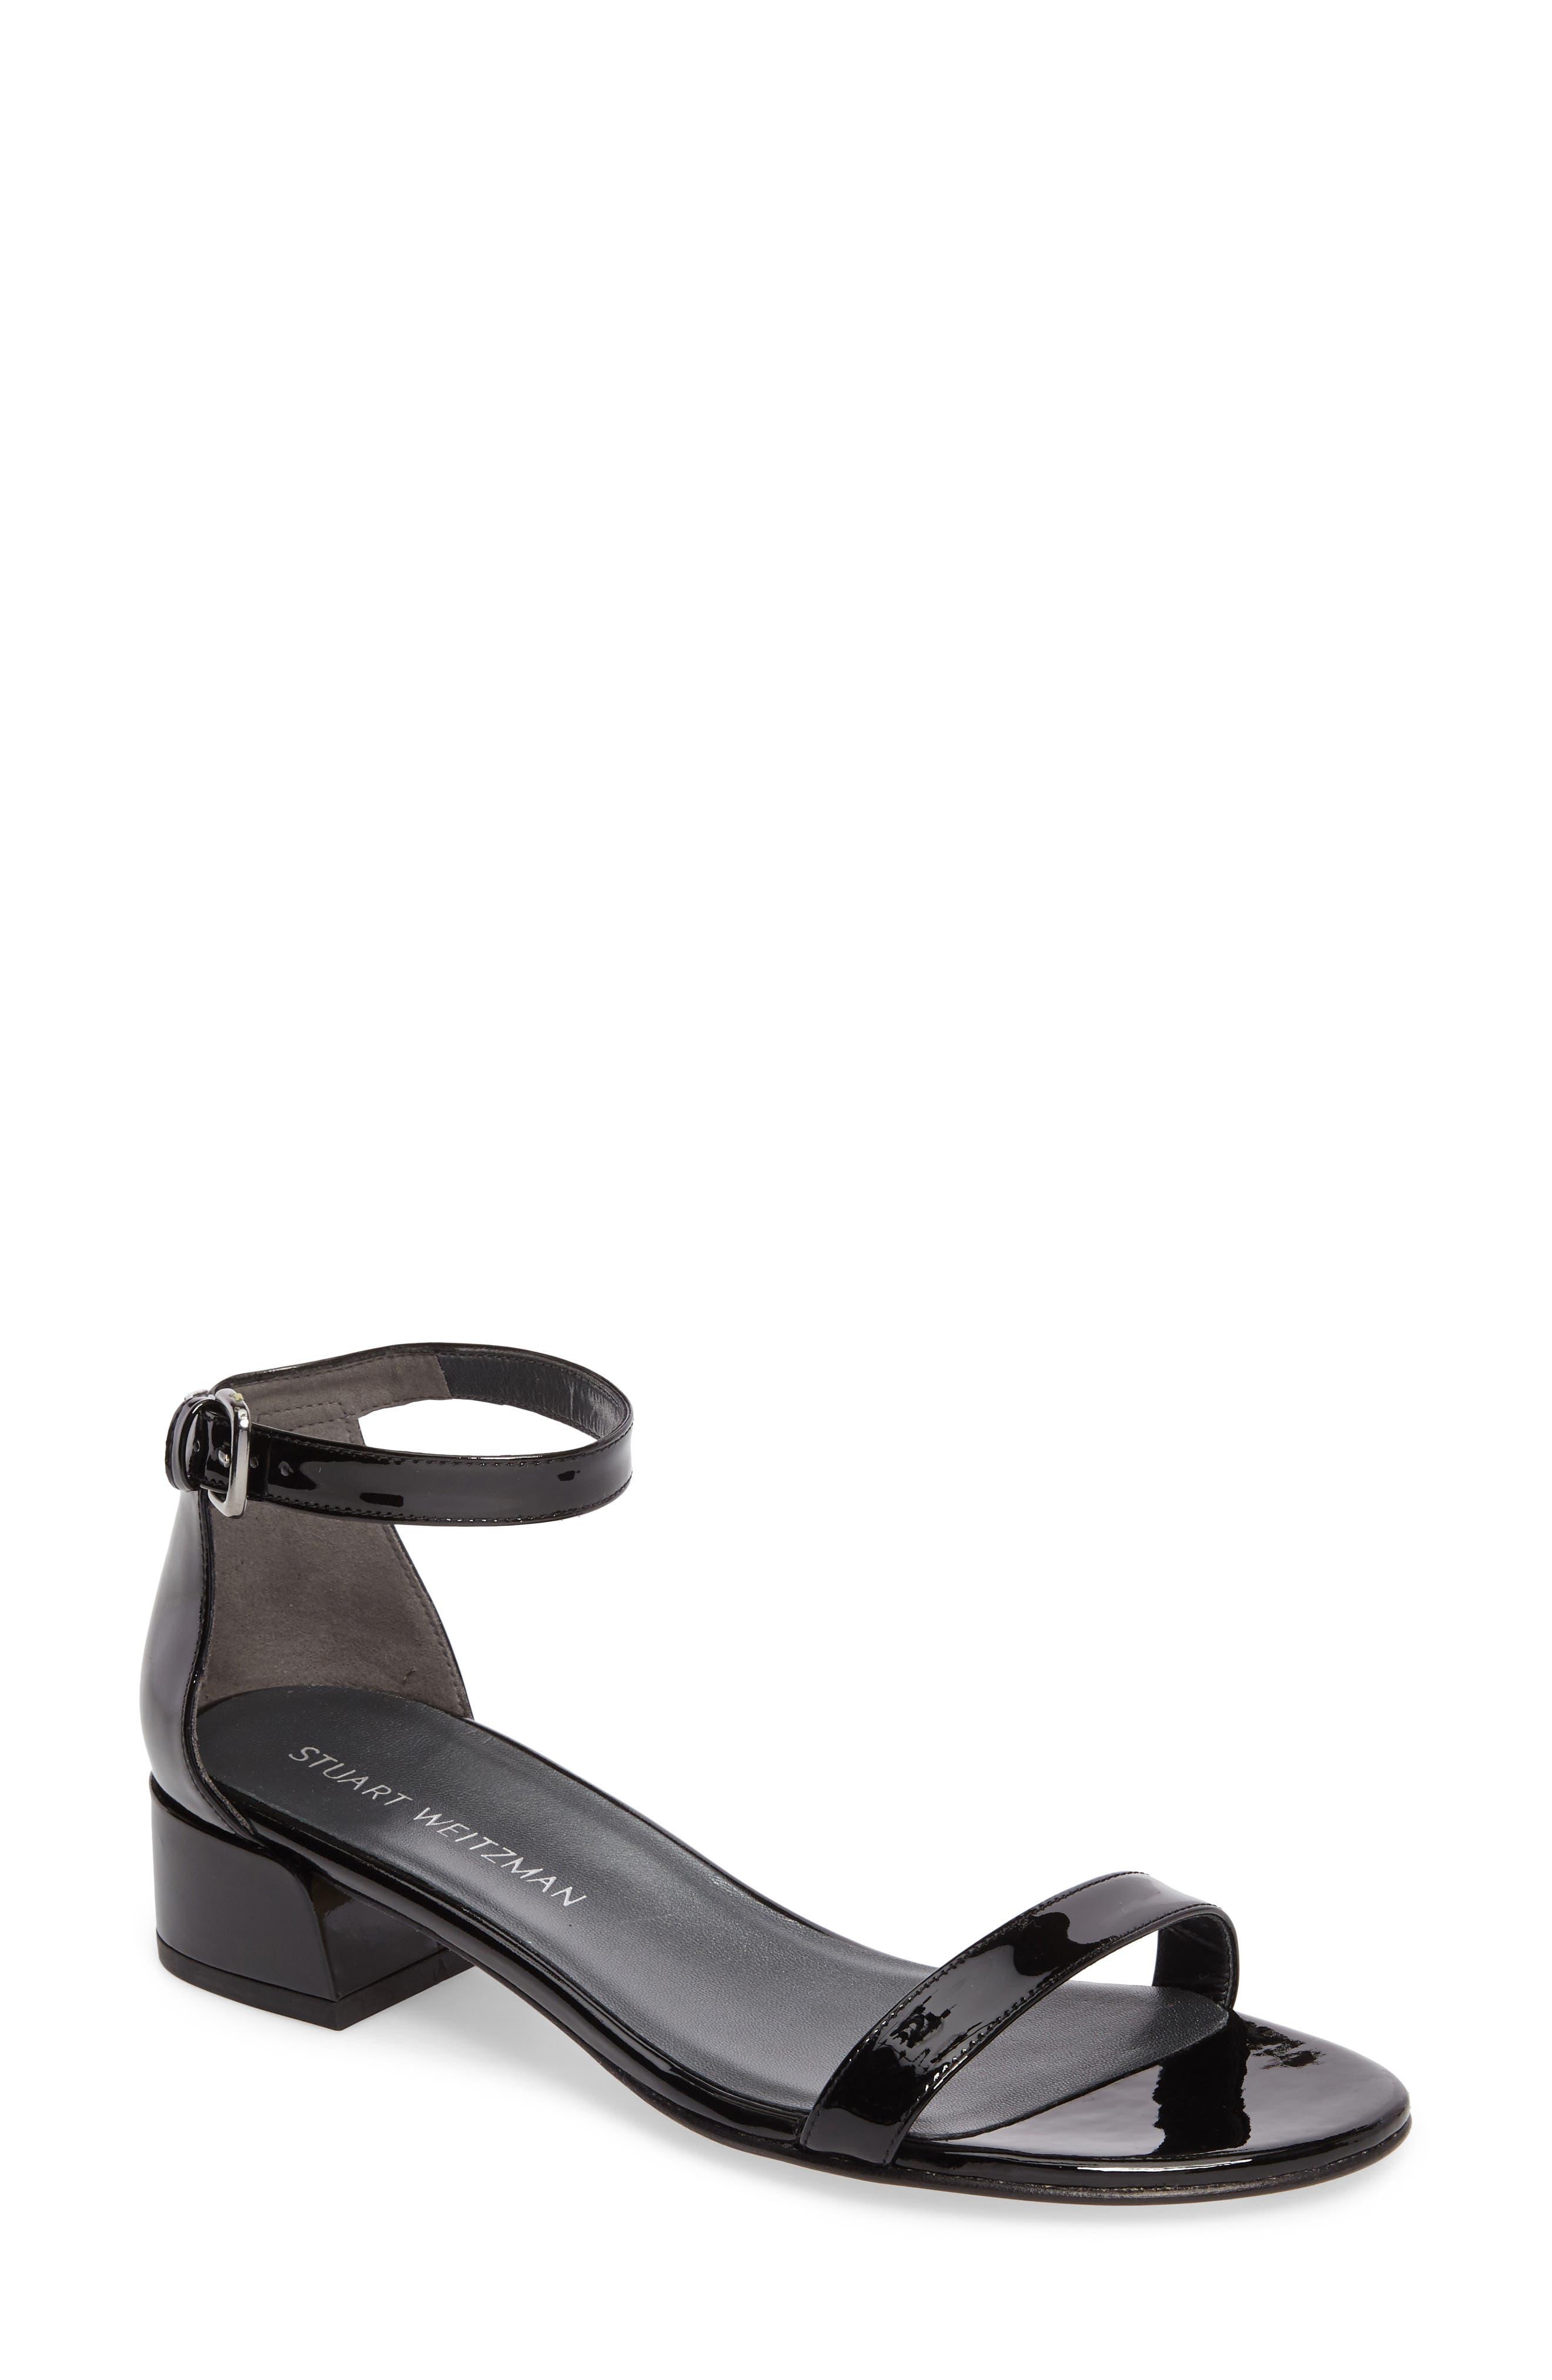 NudistJune Block Heel Sandal,                         Main,                         color, 002